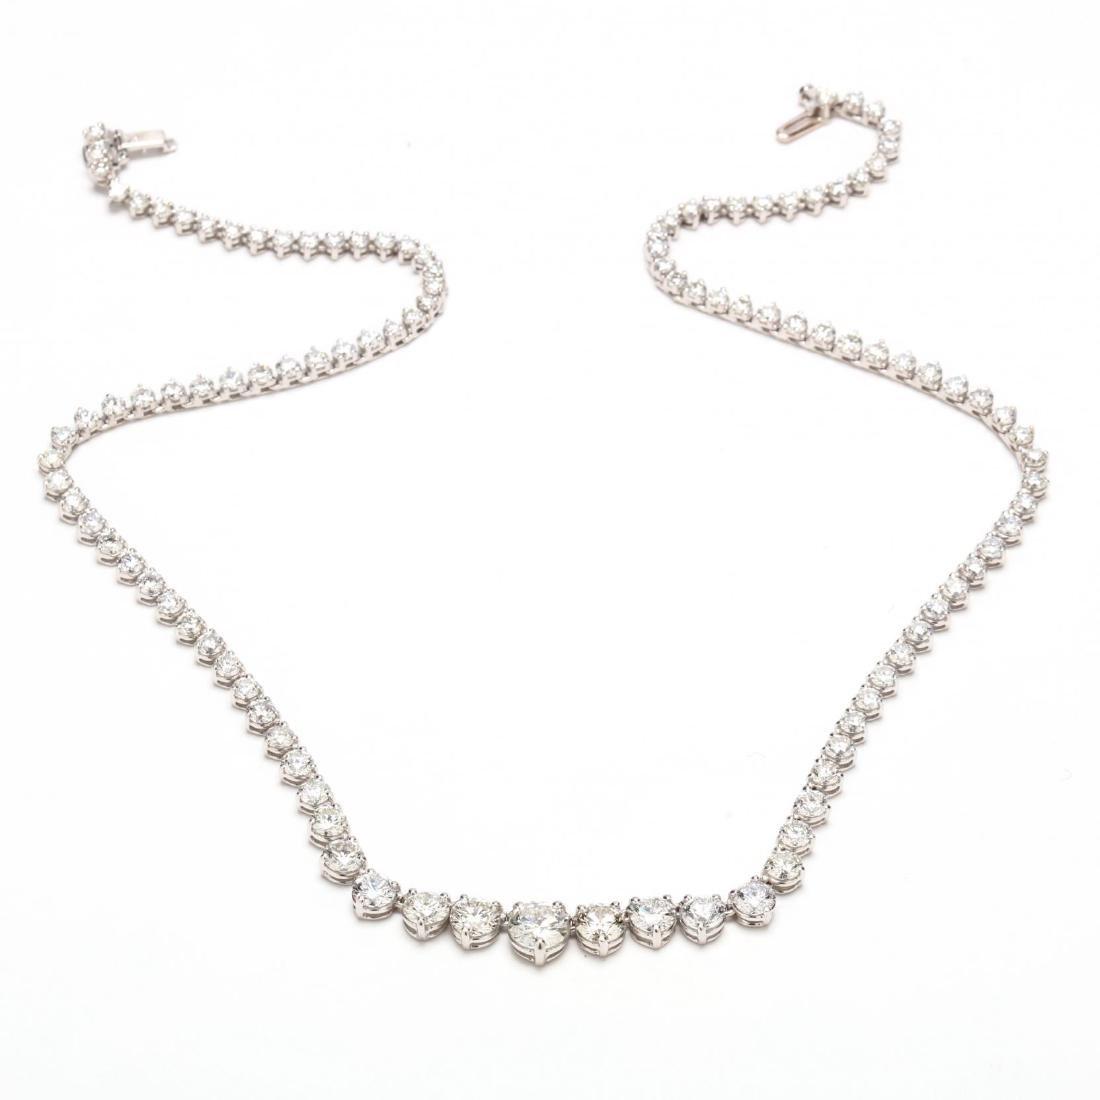 18KT Diamond Riviere Necklace